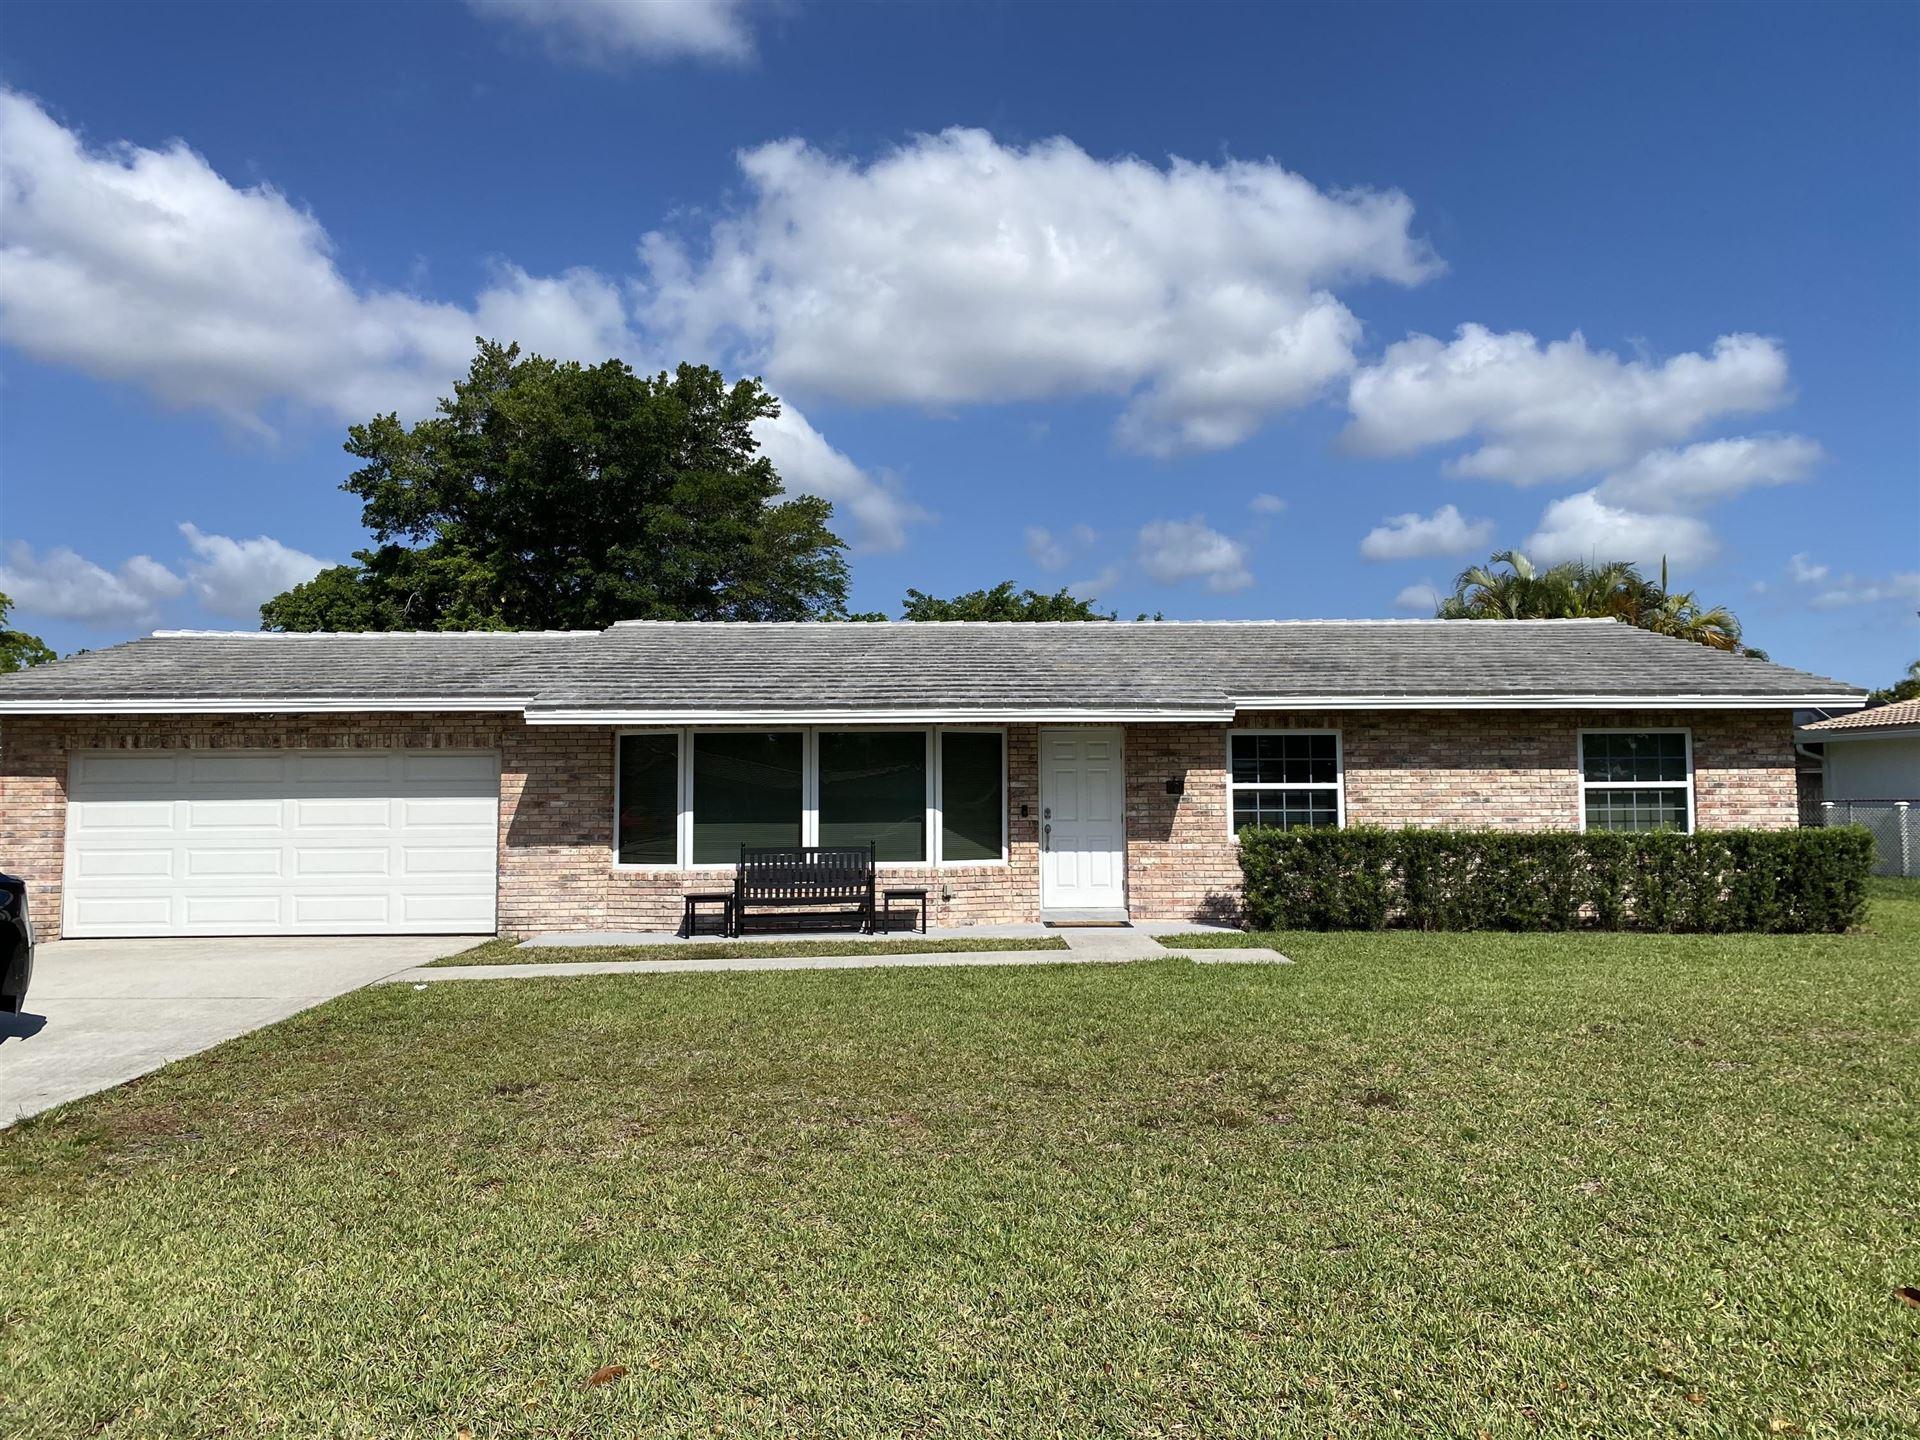 3720 NW 108 Drive, Coral Springs, FL 33065 - MLS#: RX-10713576